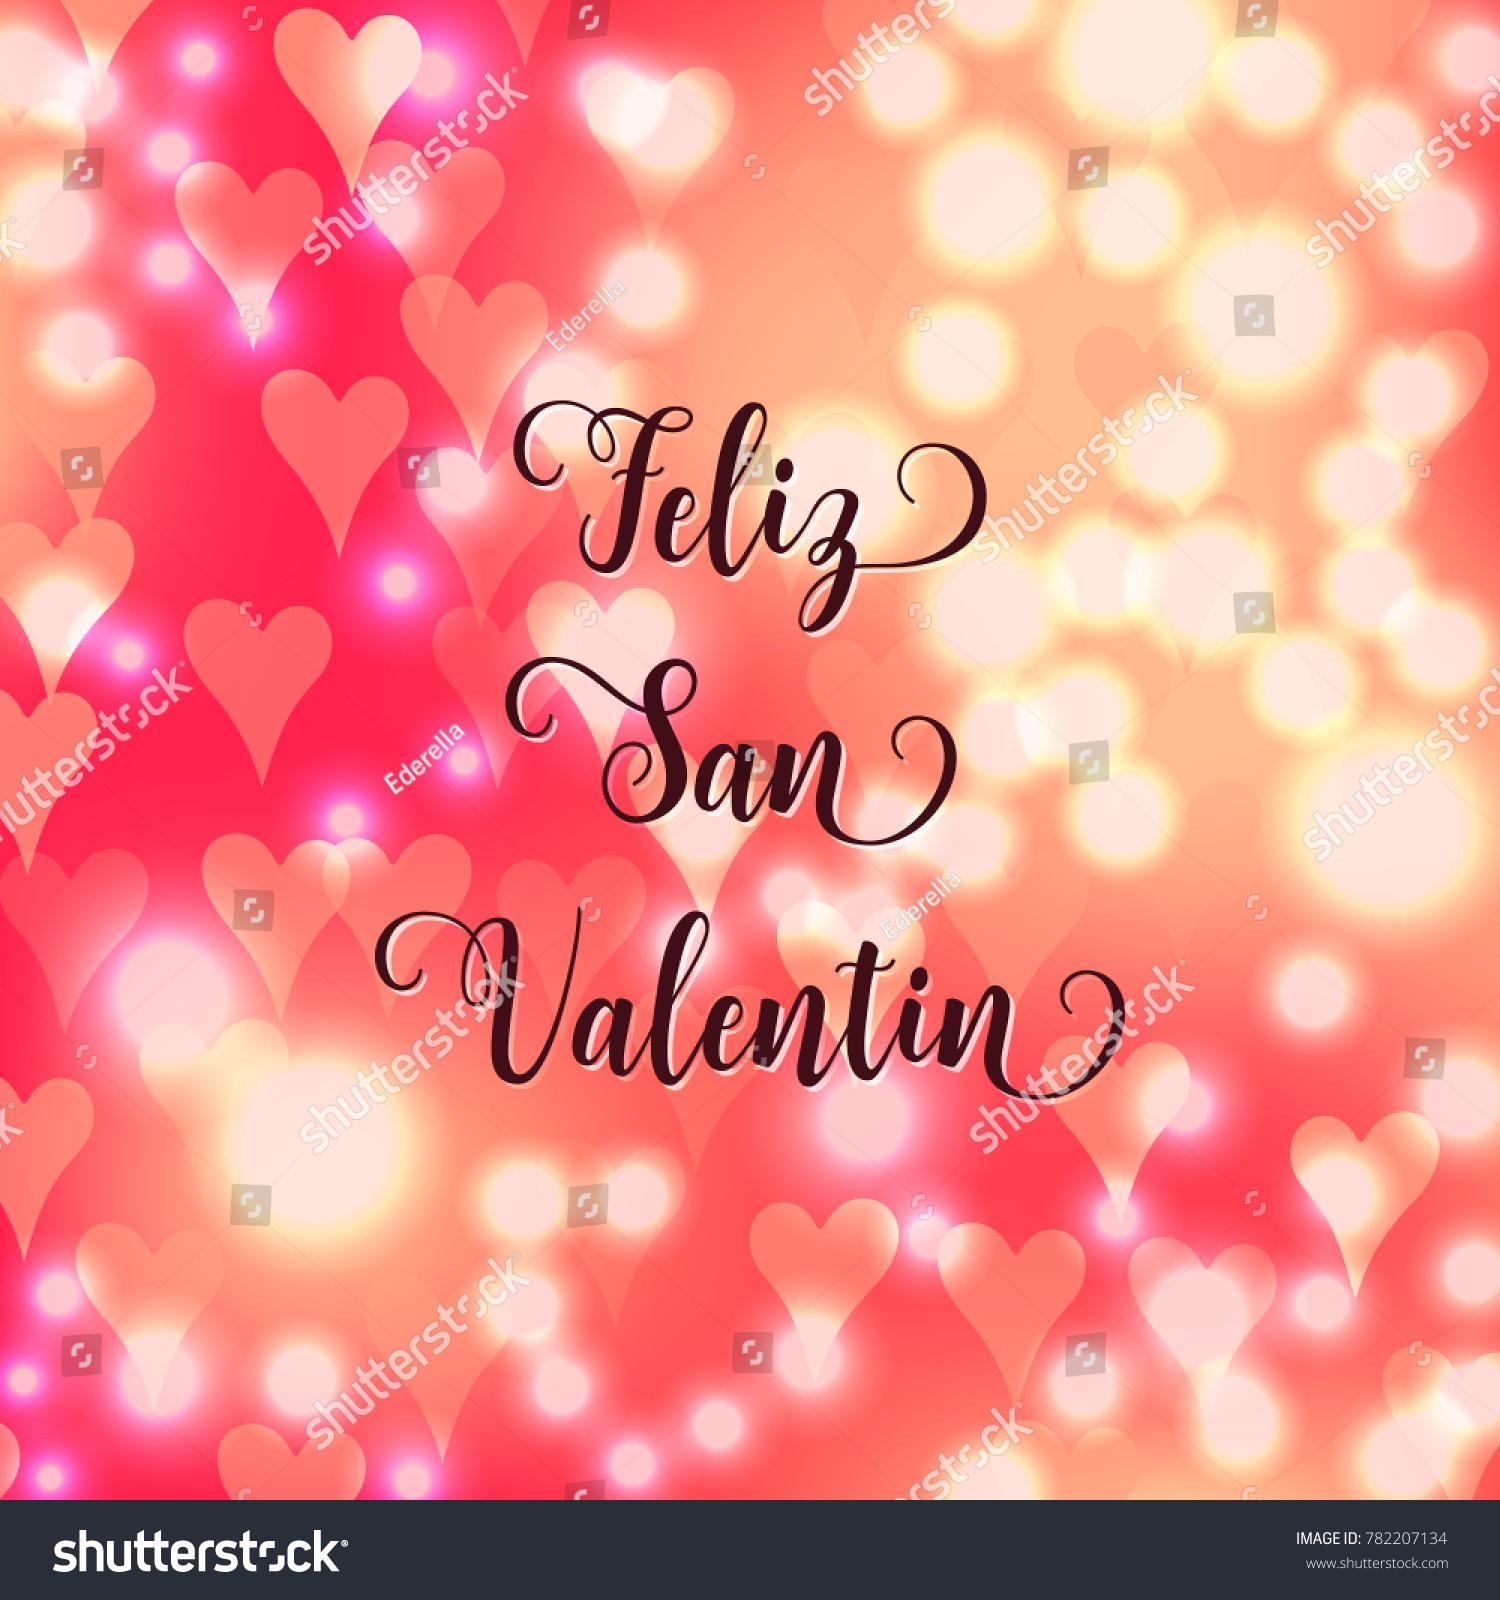 Happy Valentineu0027s Day Spanish Language Text Feliz San Valentin. Blurred  Defocused Background With Hearts.